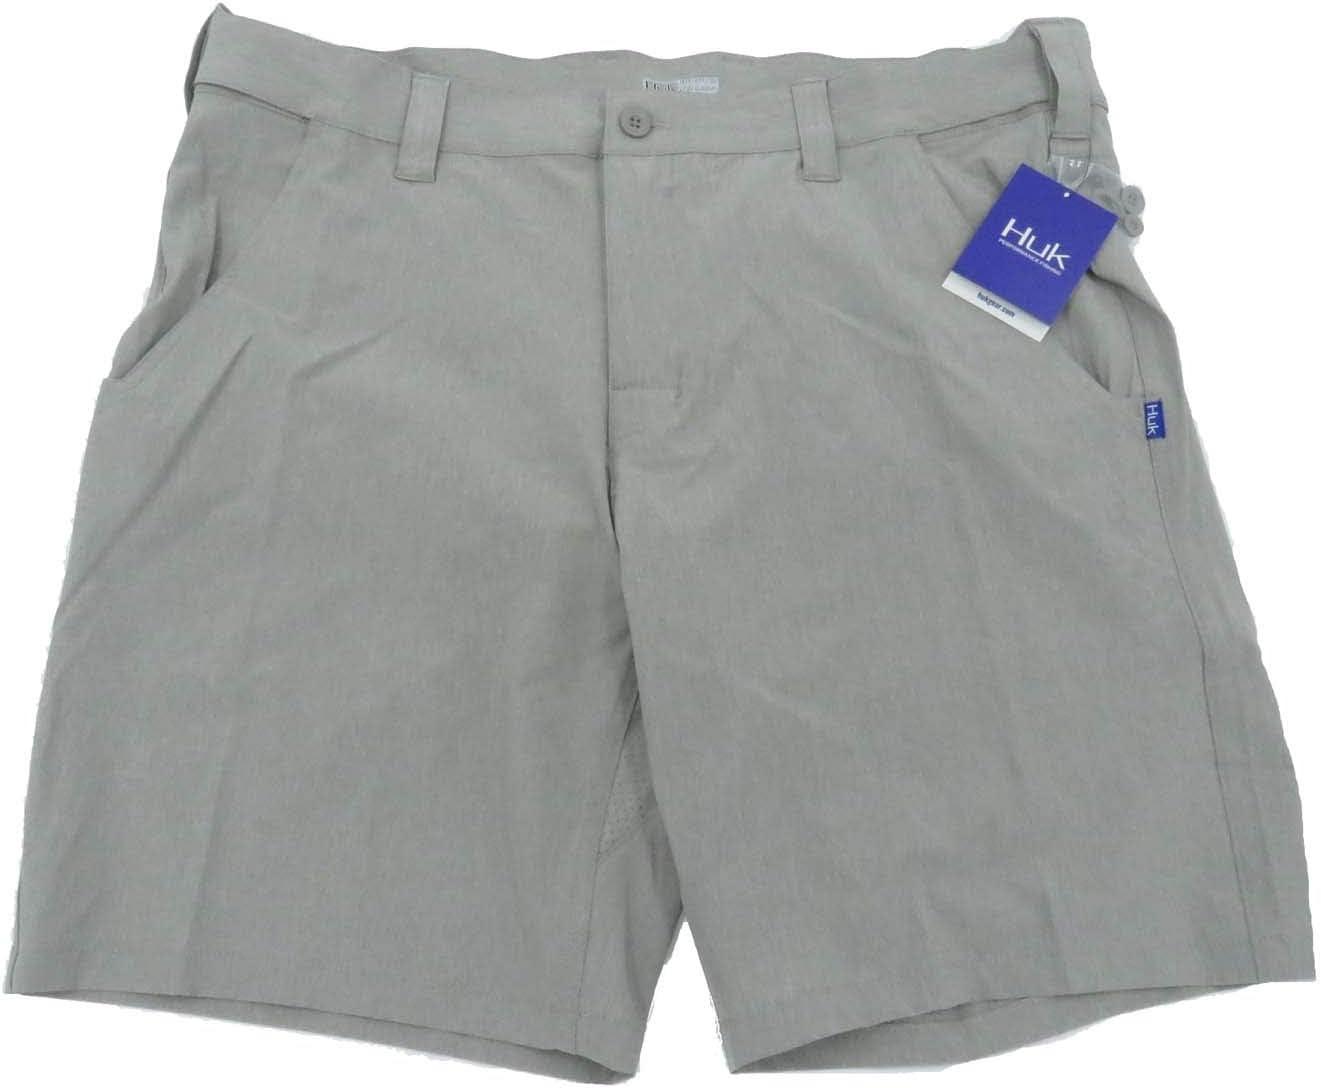 HUK Men's H2000059-401